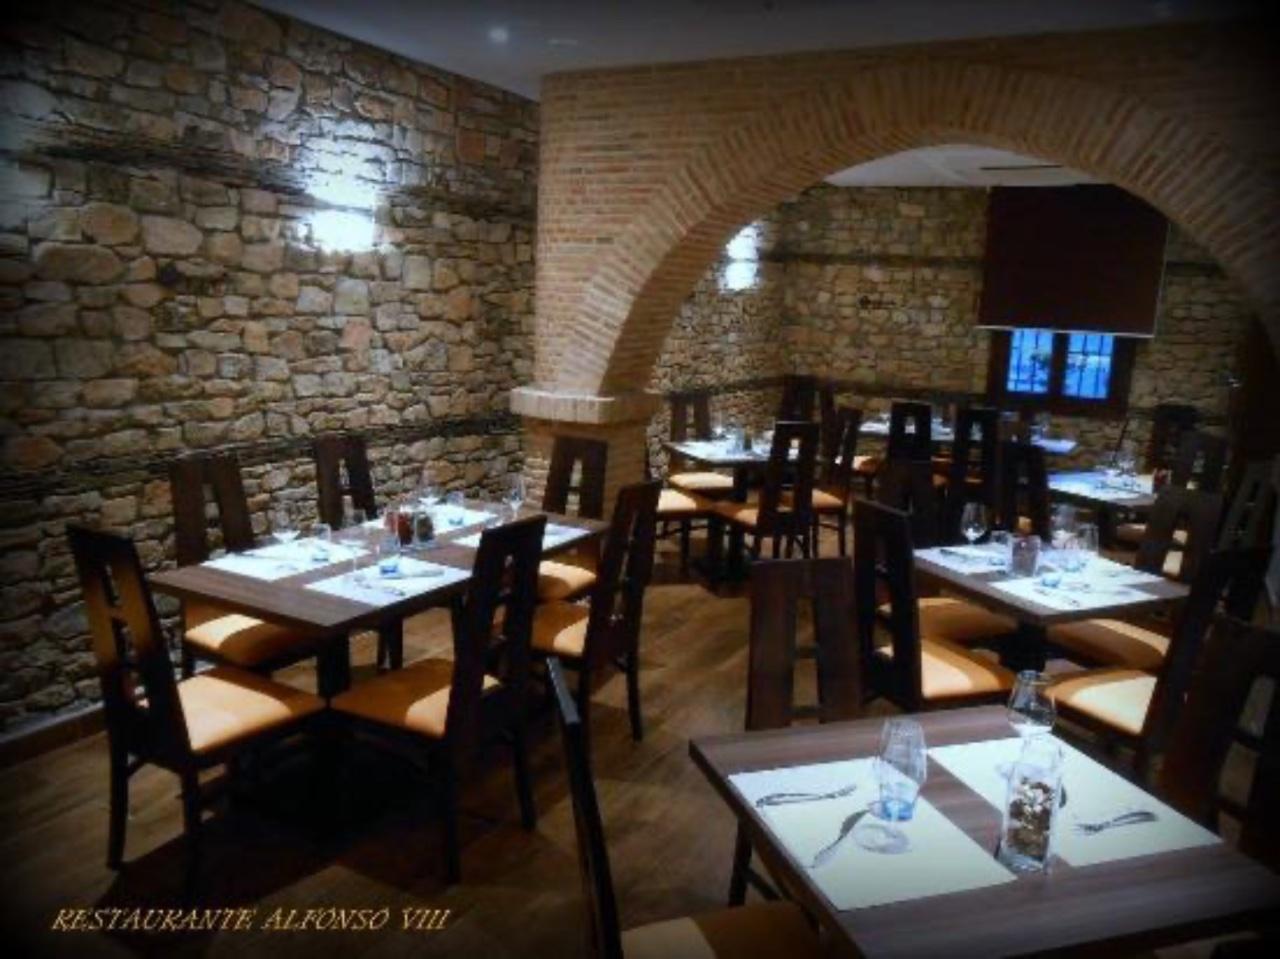 Restaurante Alfonso VIII